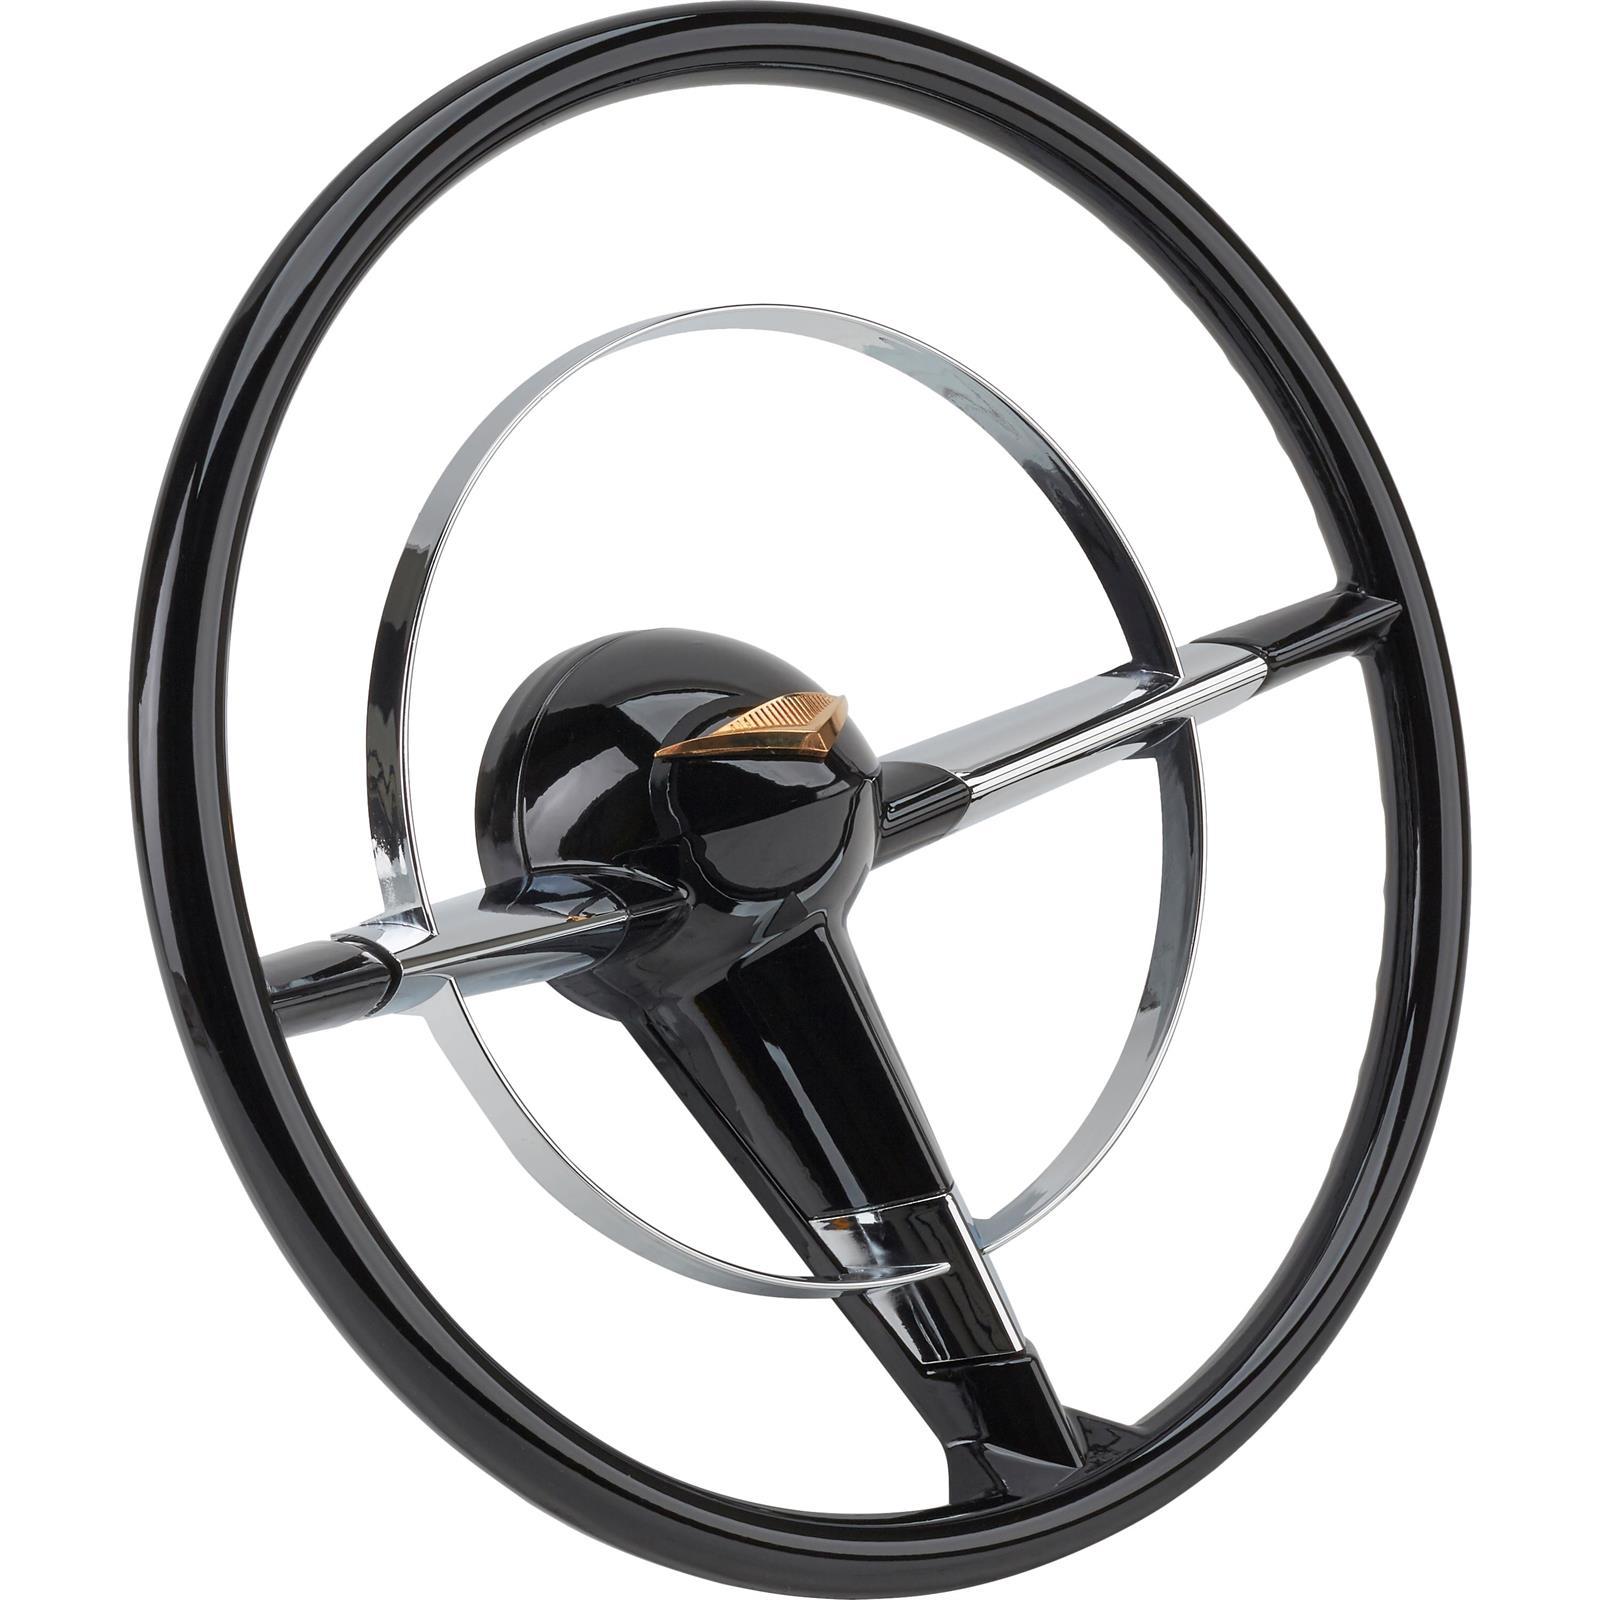 1955 chevy steering column diagram speedway 1955 56 chevy car 15 inch steering wheel  1955 56 chevy car 15 inch steering wheel